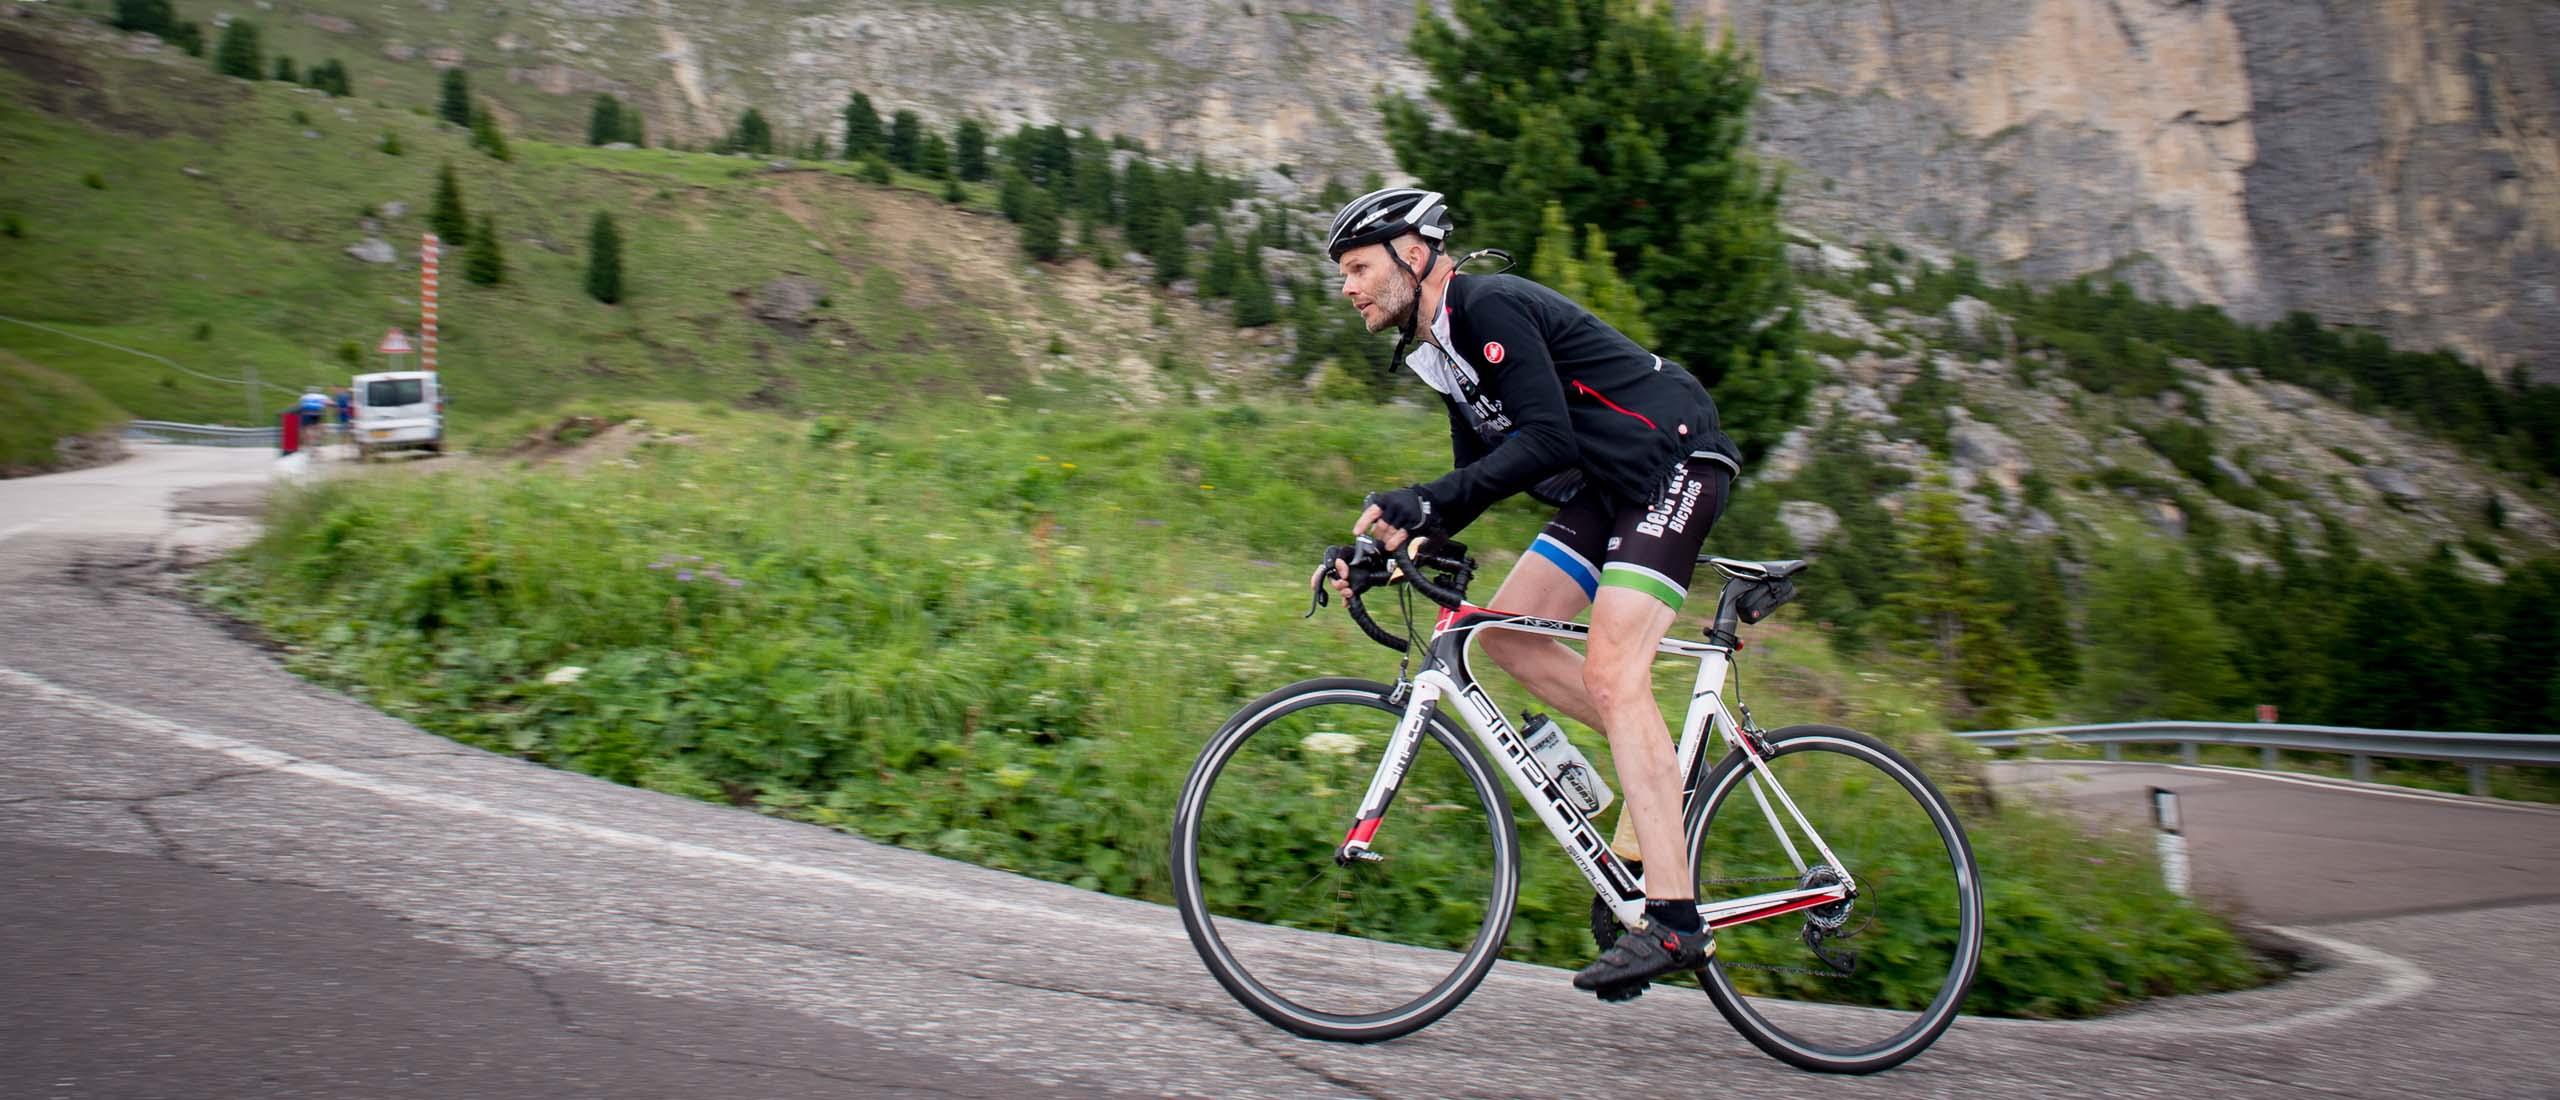 wielerfotografie Italie tijdens Giro di Kika